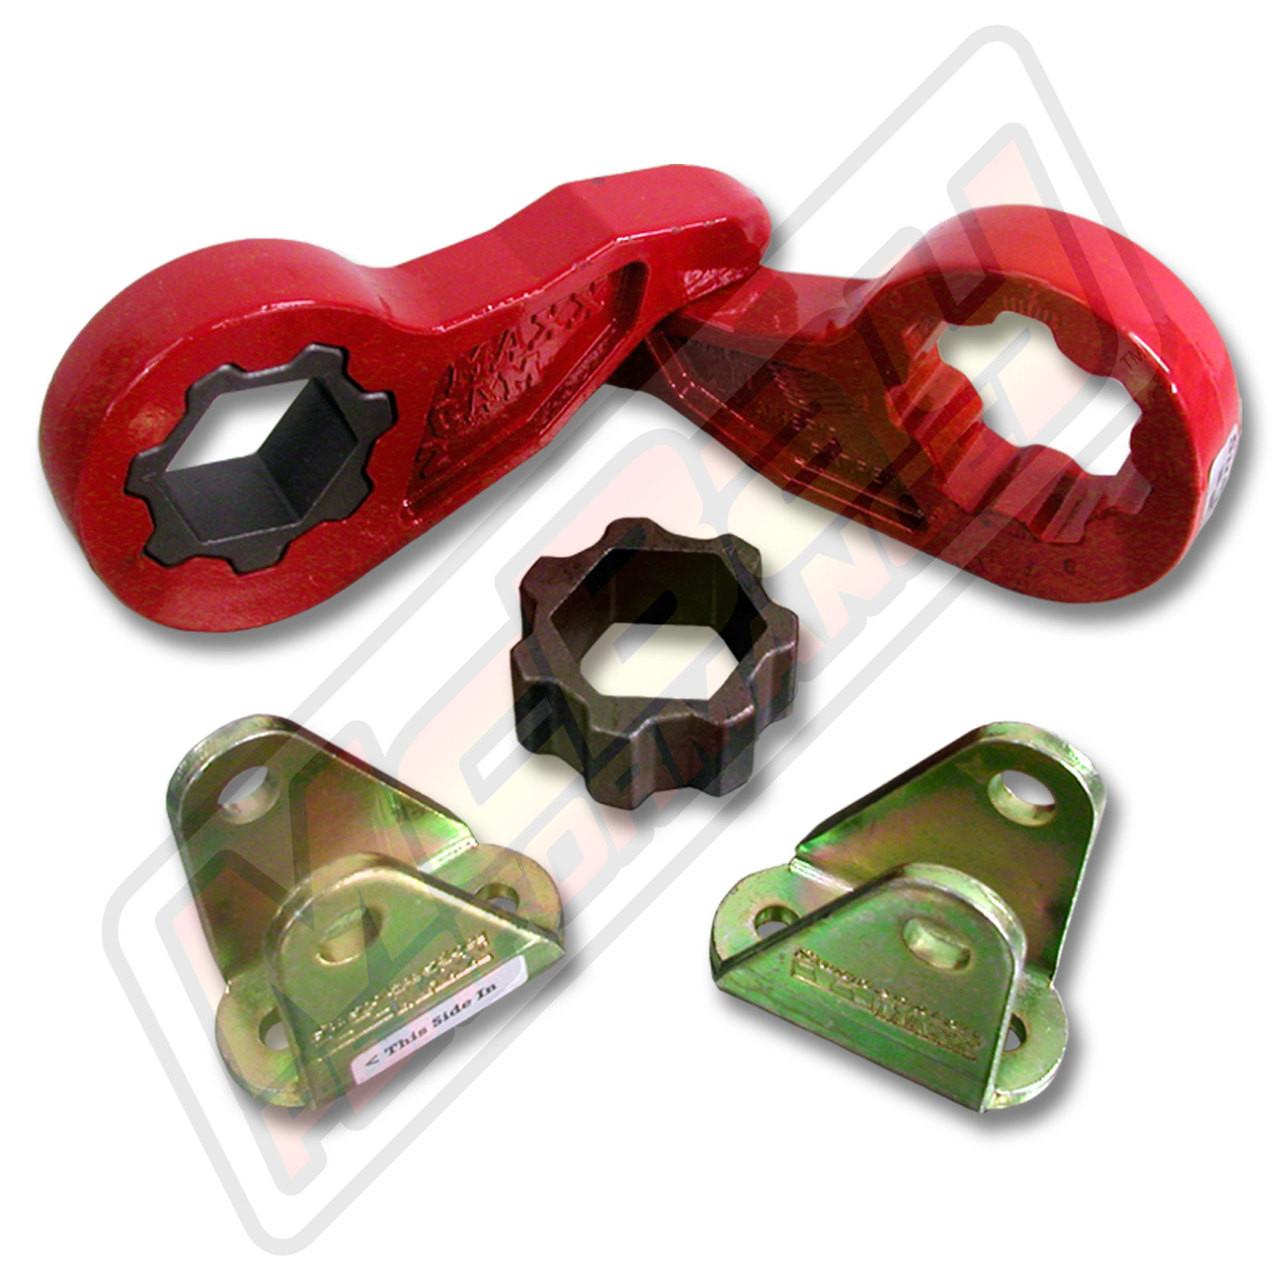 "SMX-MC2HD - 2.5"" Front Torsion Bar Key Leveling Kit"